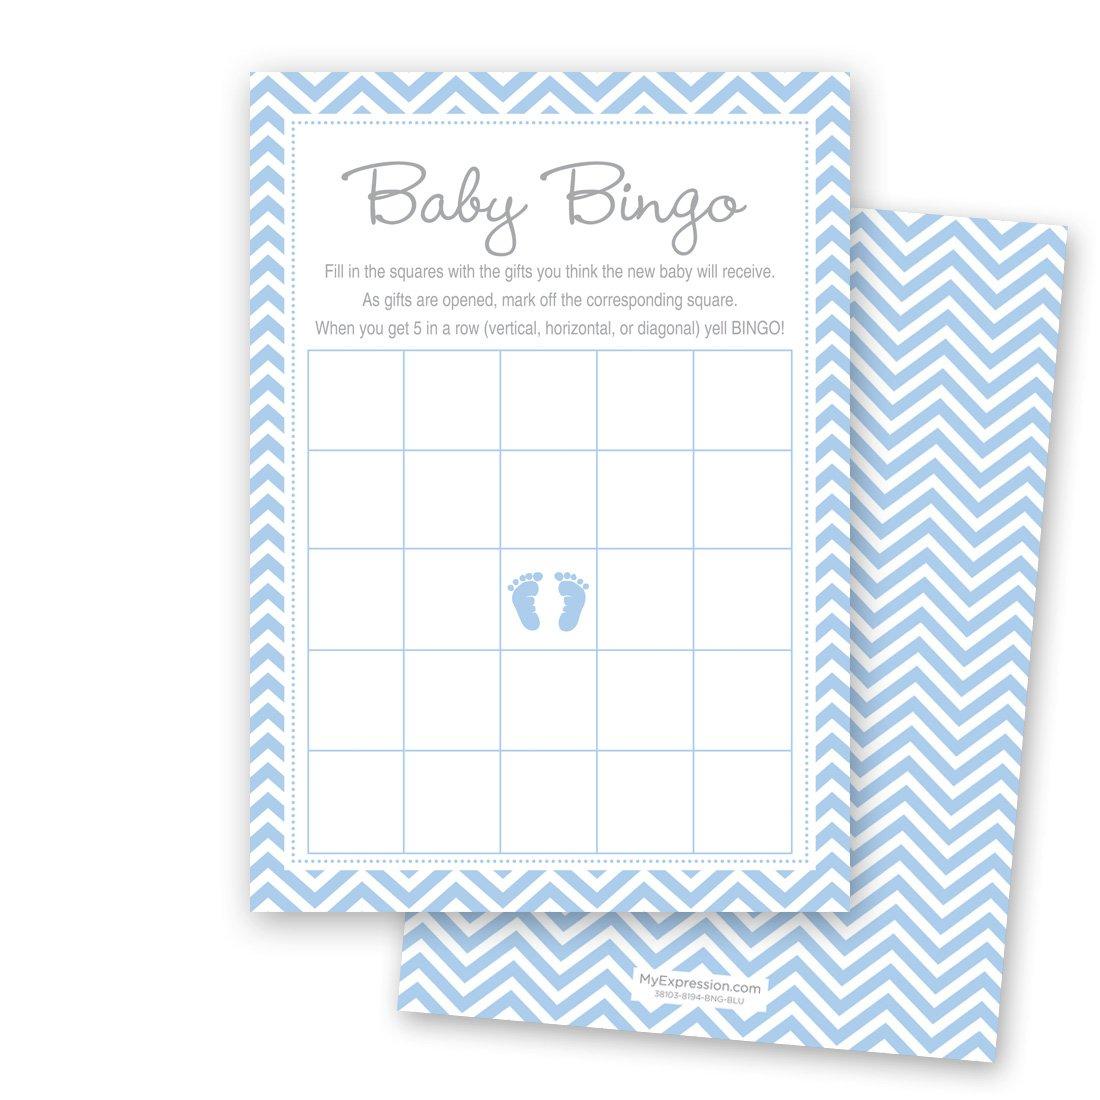 MyExpression.com 24 Cnt Blue Baby Feet Footprint Baby Bingo Cards